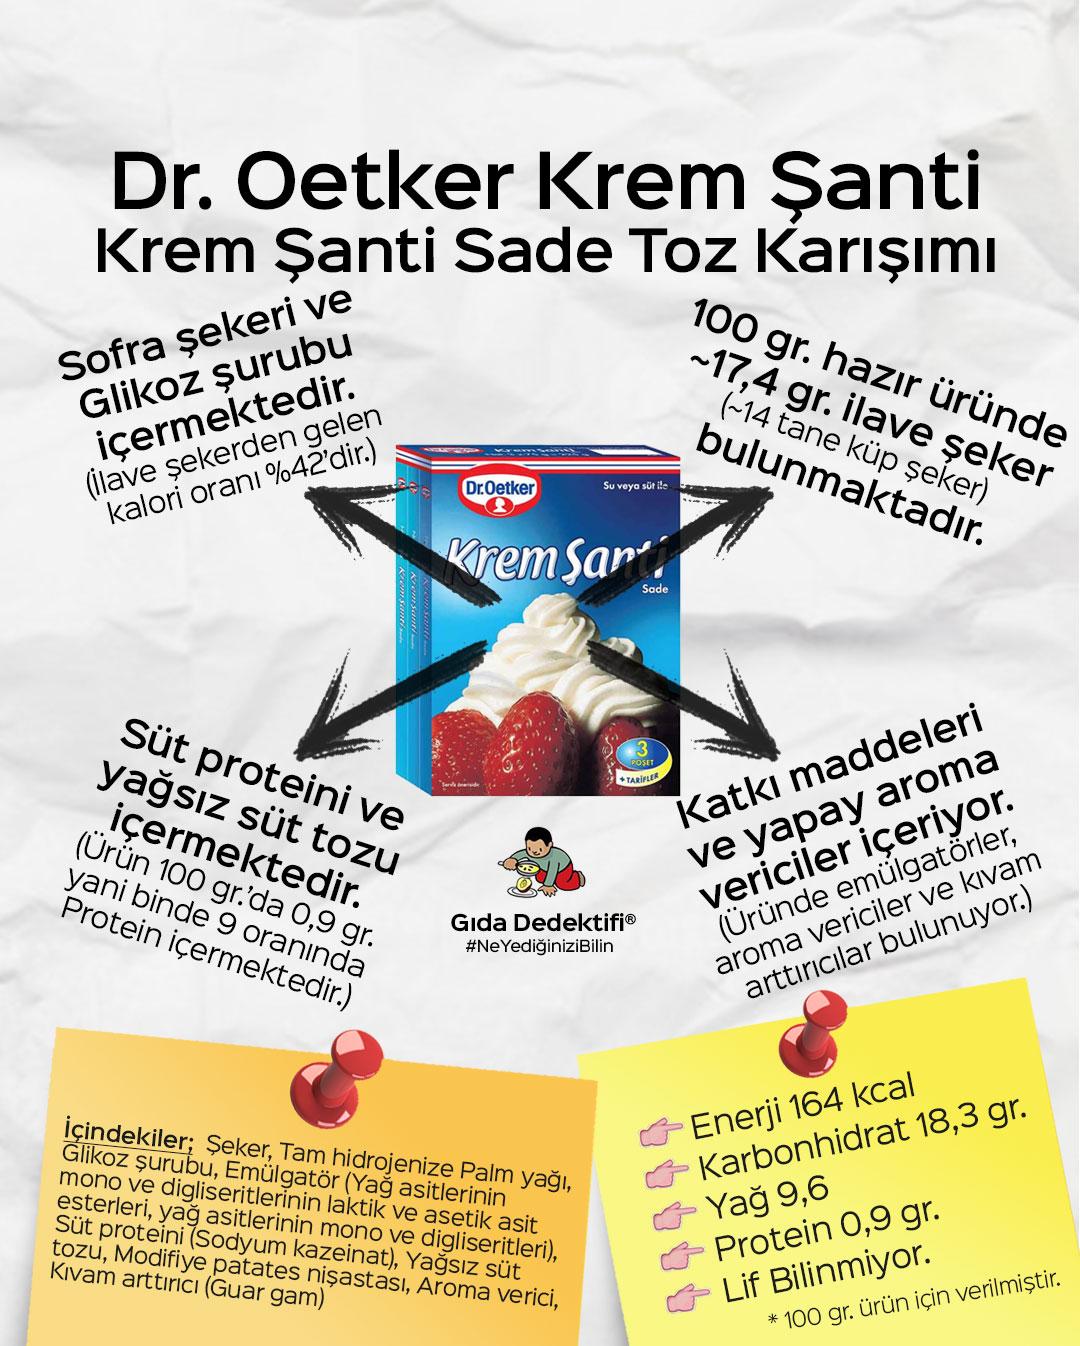 Dr. Oetker Krem Şanti - Gıda Dedektifi